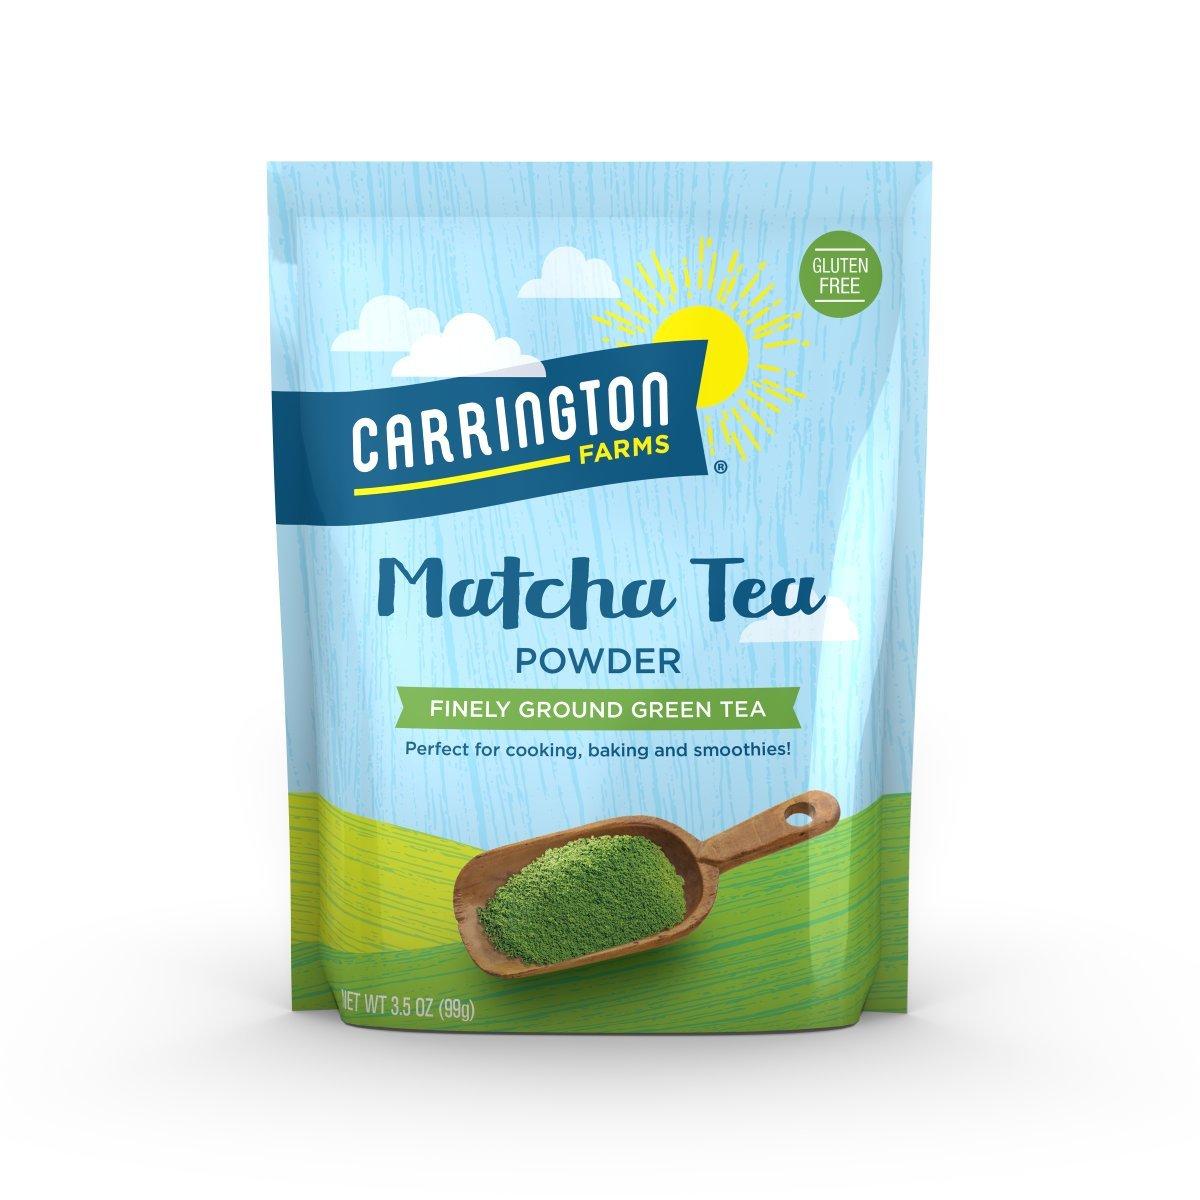 Carrington Farms Matcha Tea Powder 3.5 oz Pack of 2